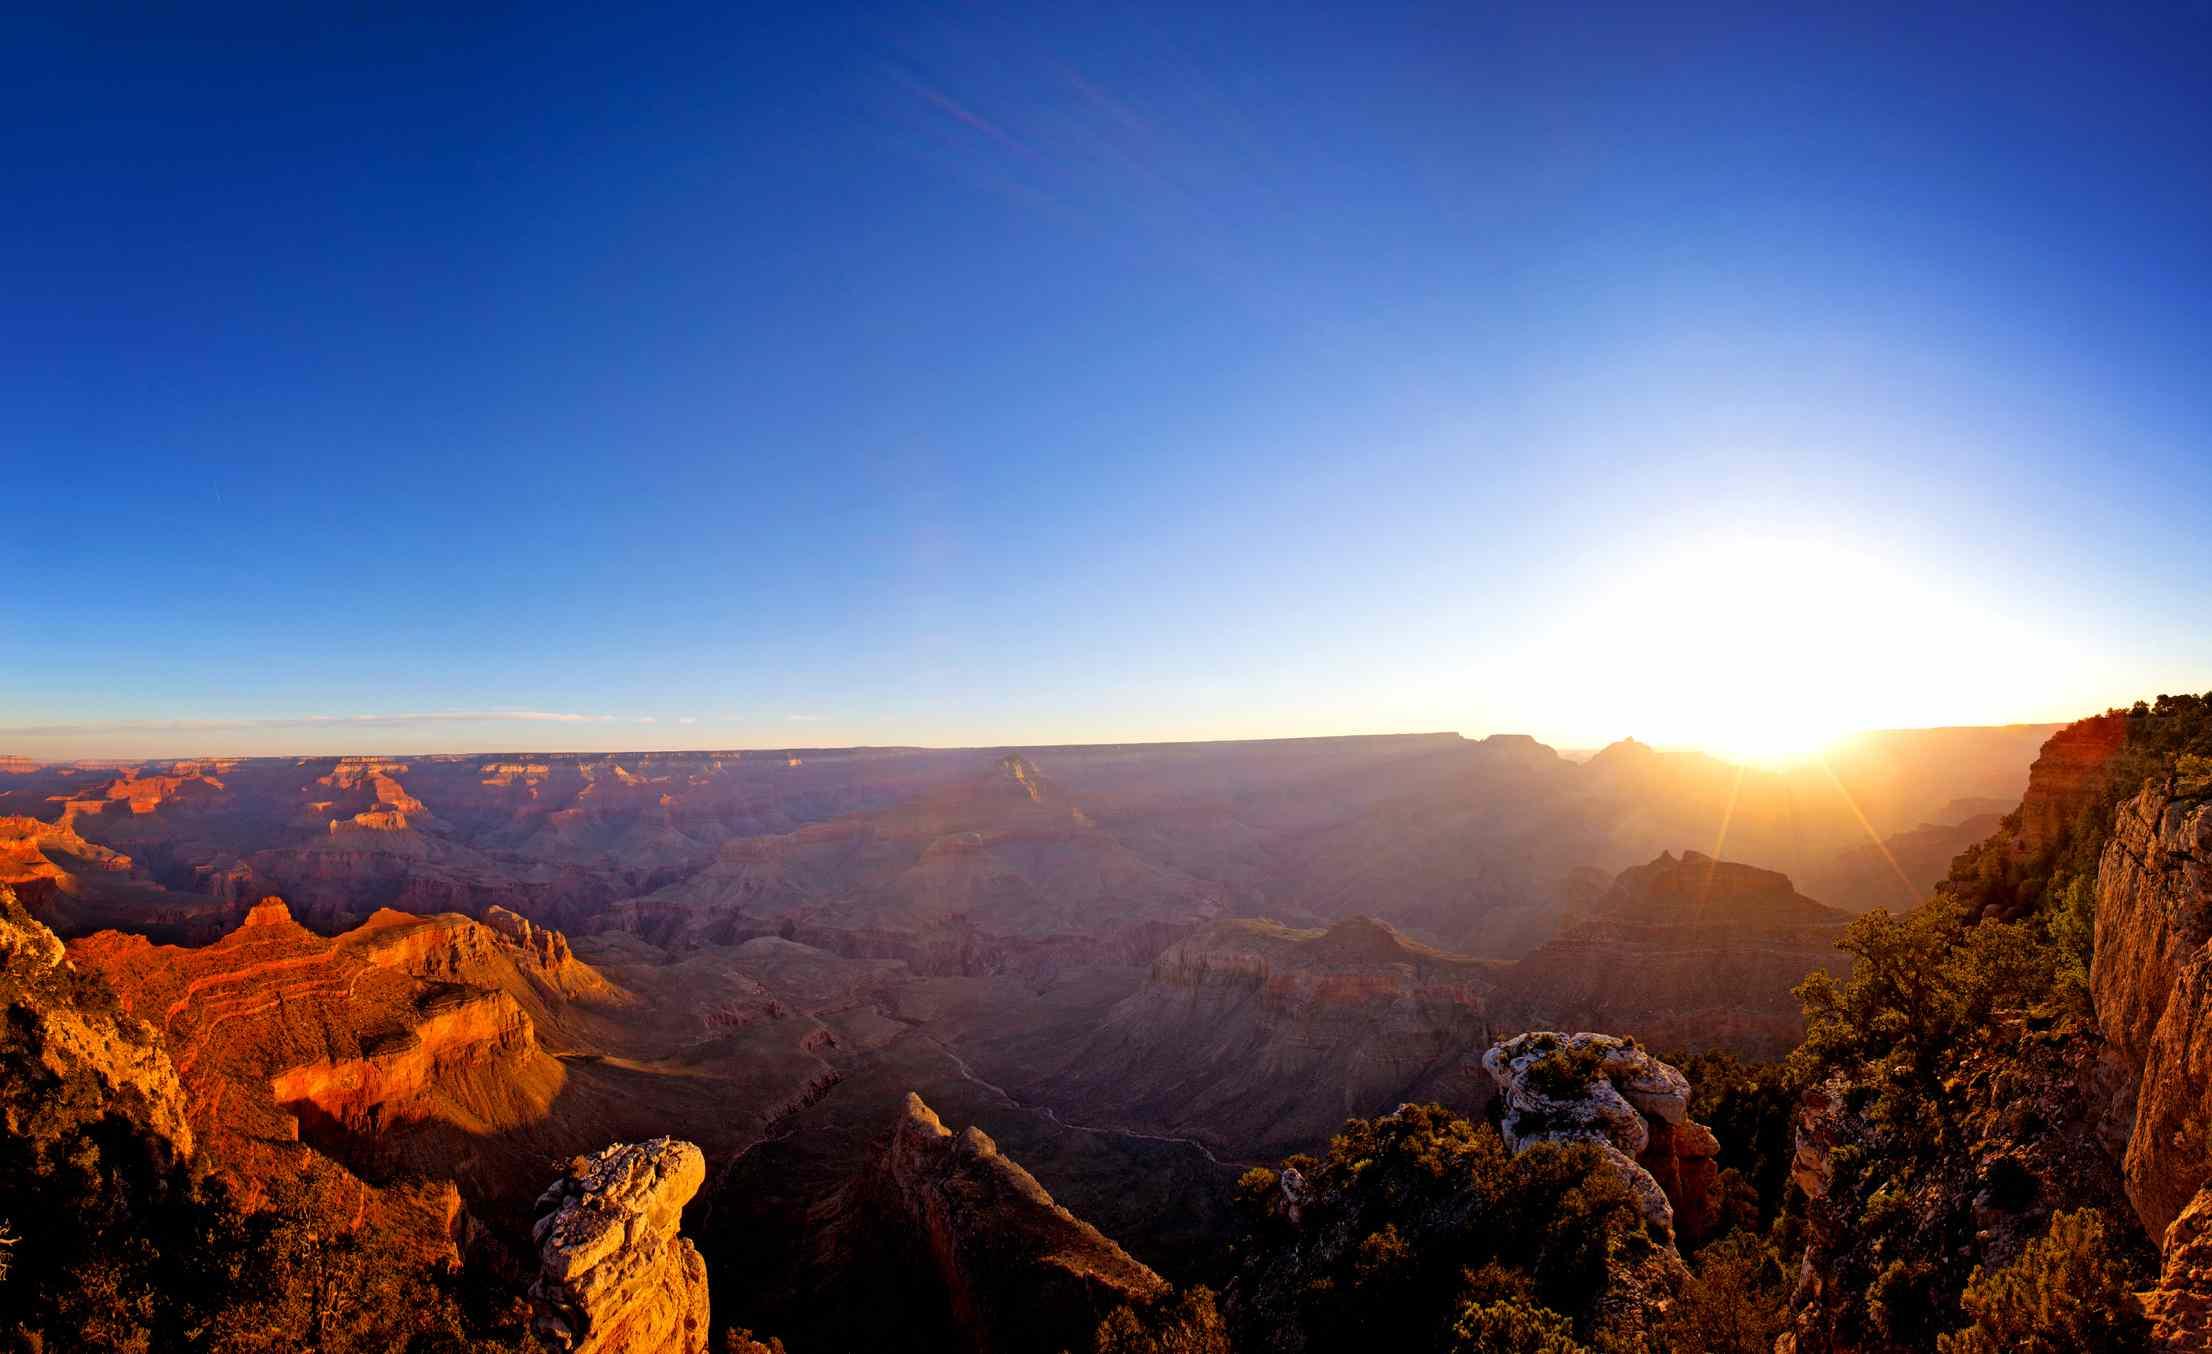 Sunrise over Yaki Point, Grand Canyon National Park